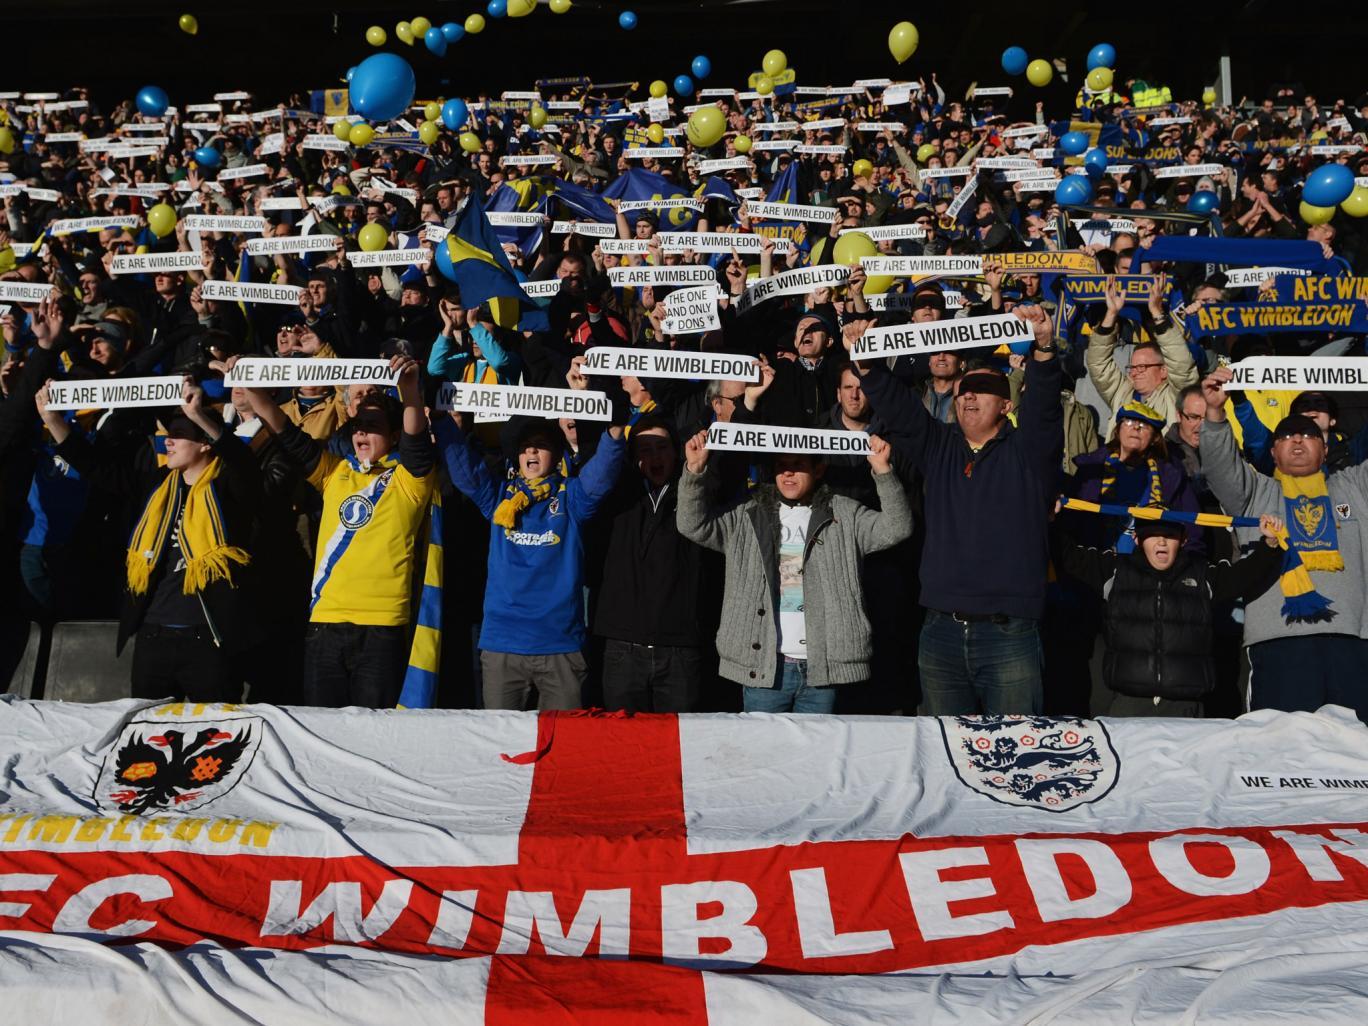 AFC Wimbledon: Kisah 'The Crazy Gang' Dan Perpecahan Mereka Dari Wimbledon FC